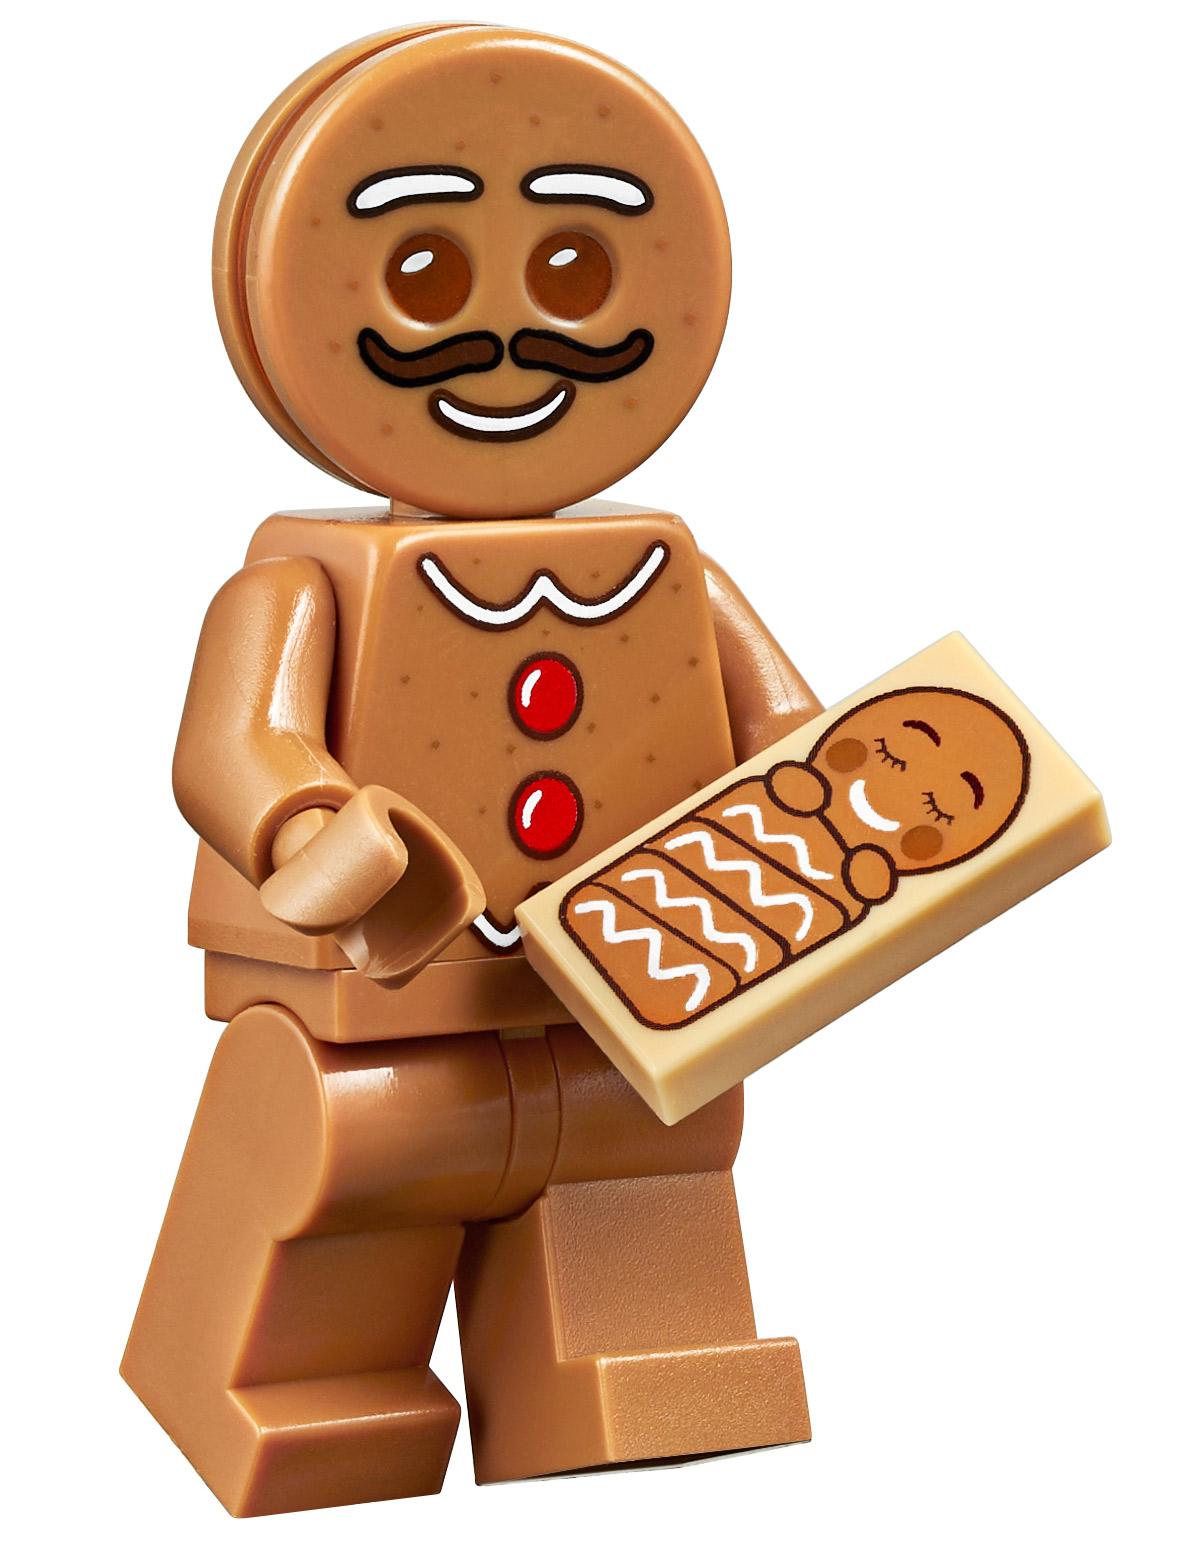 lego-creator-expert-10267-lebkuchenhaus-gingerbread-house-2019-papa-baby zusammengebaut.com